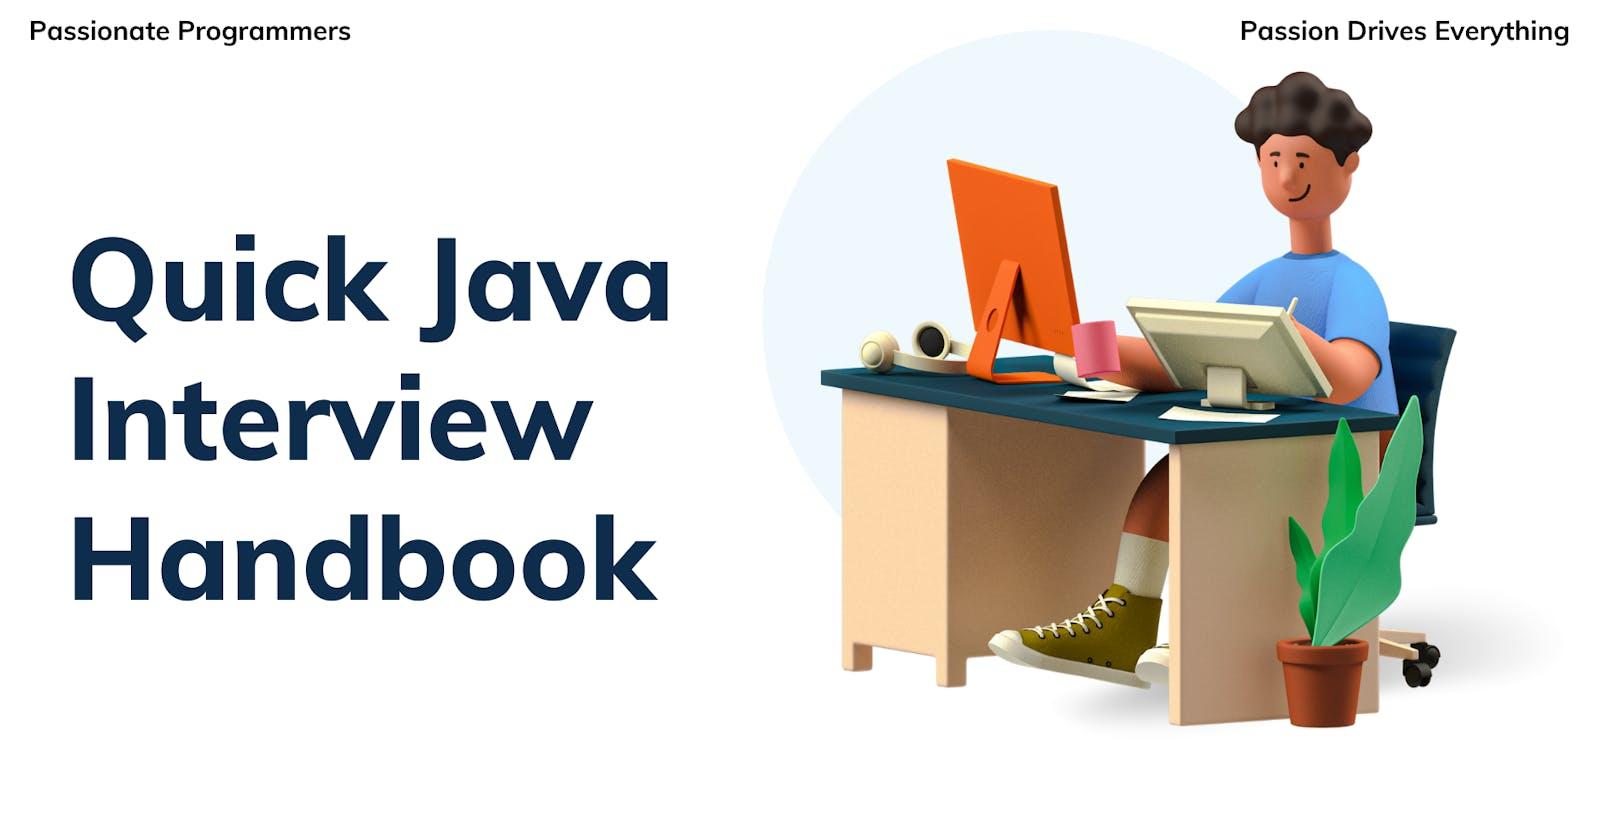 Quick Java Interview Handbook